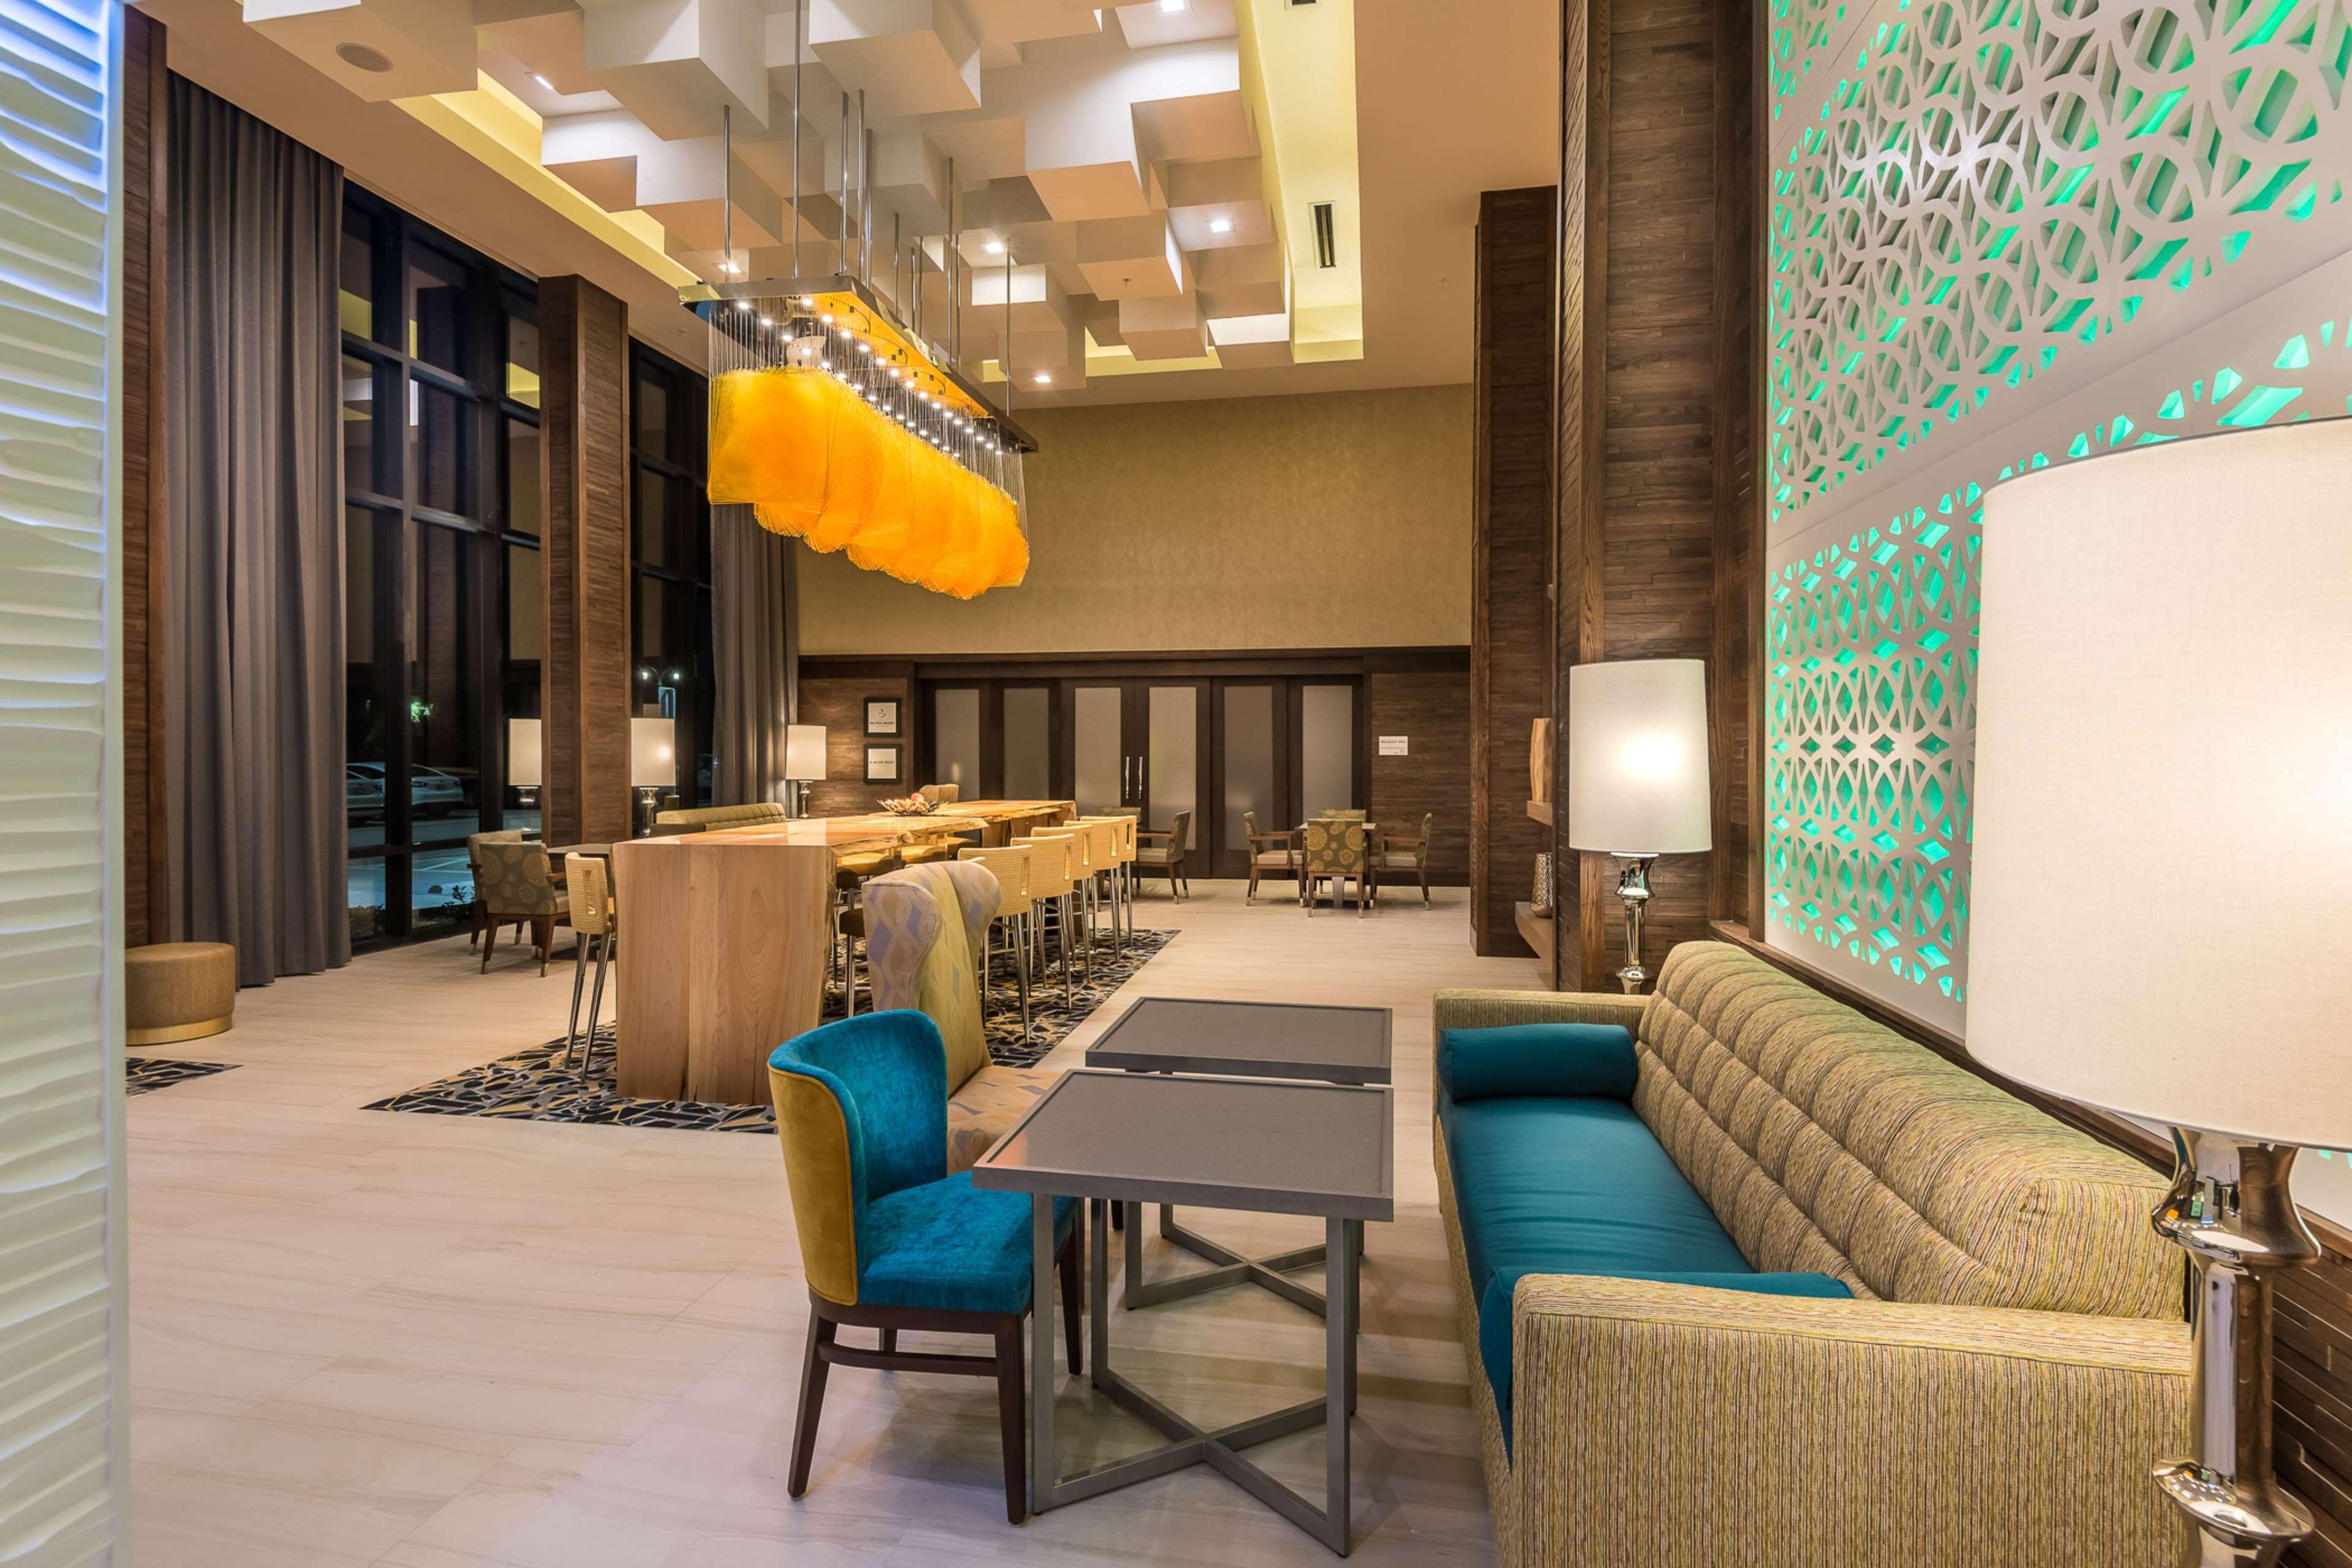 Hampton Inn & Suites Dallas-The Colony, TX image 4